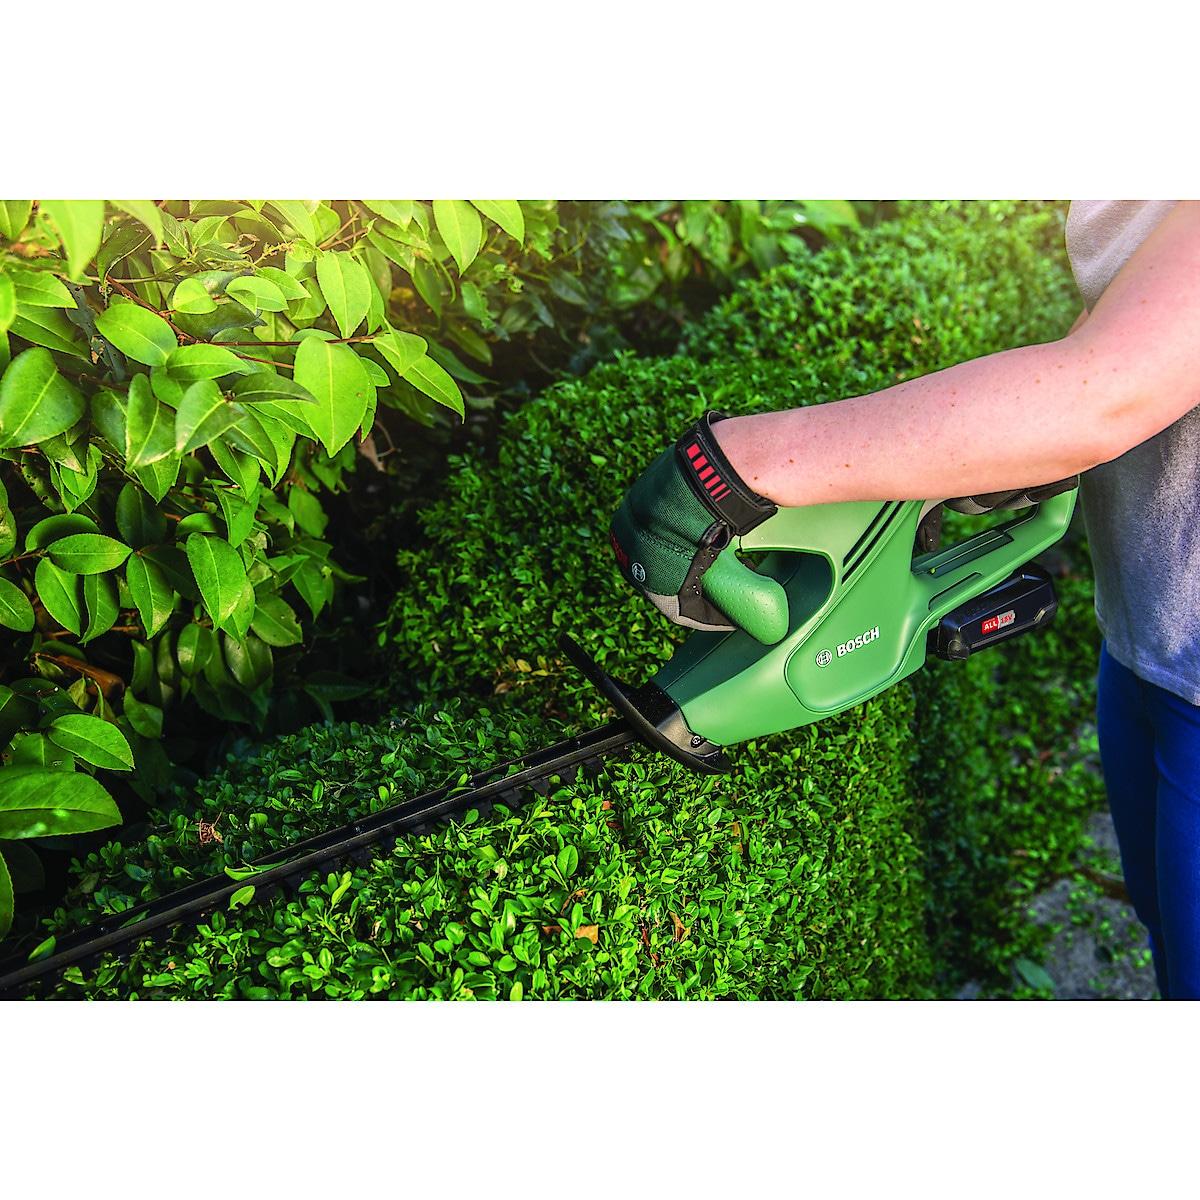 Häcksax Bosch Easy Hedgecut 18-45